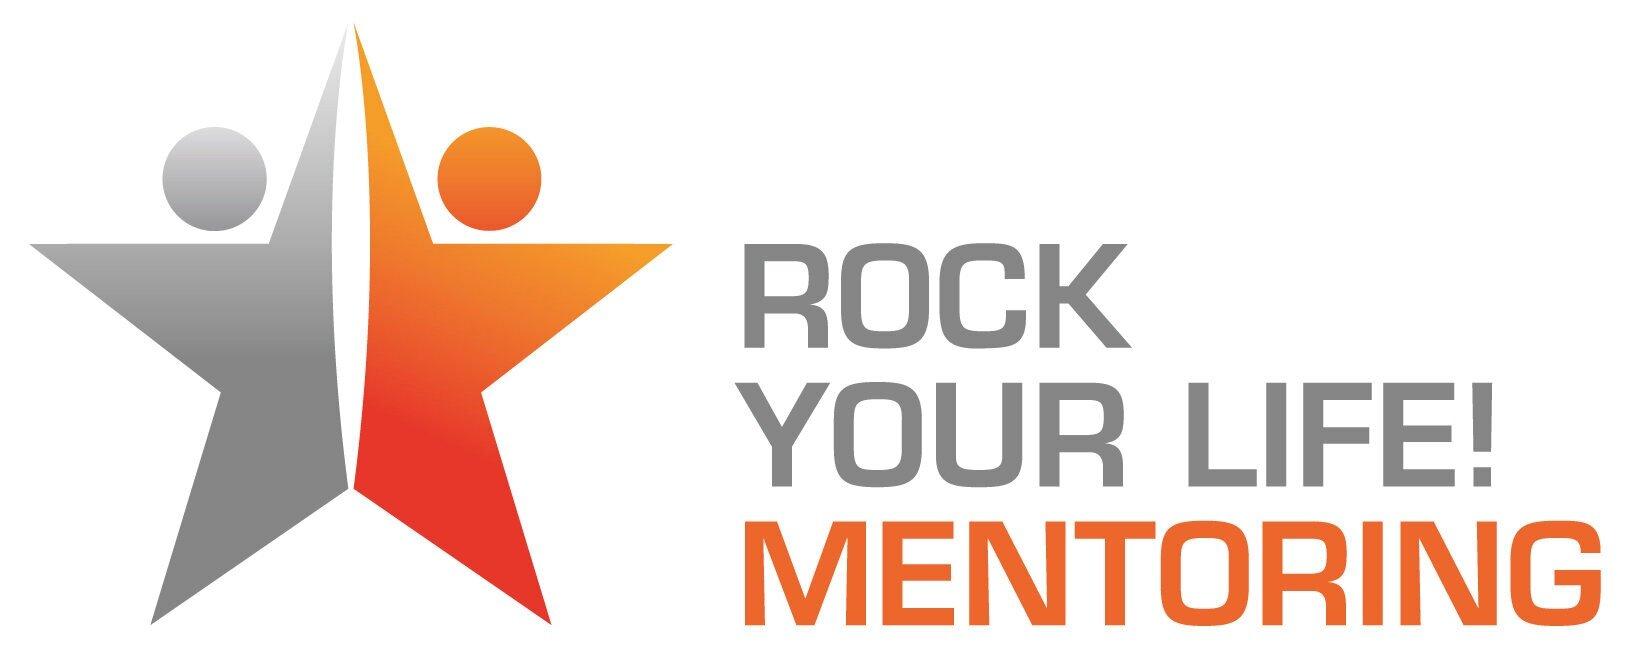 ROCK_YOUR_LIFE%21_official_Logo_of_ROCK_YOUR_LIFE%21_gGmbH.jpg